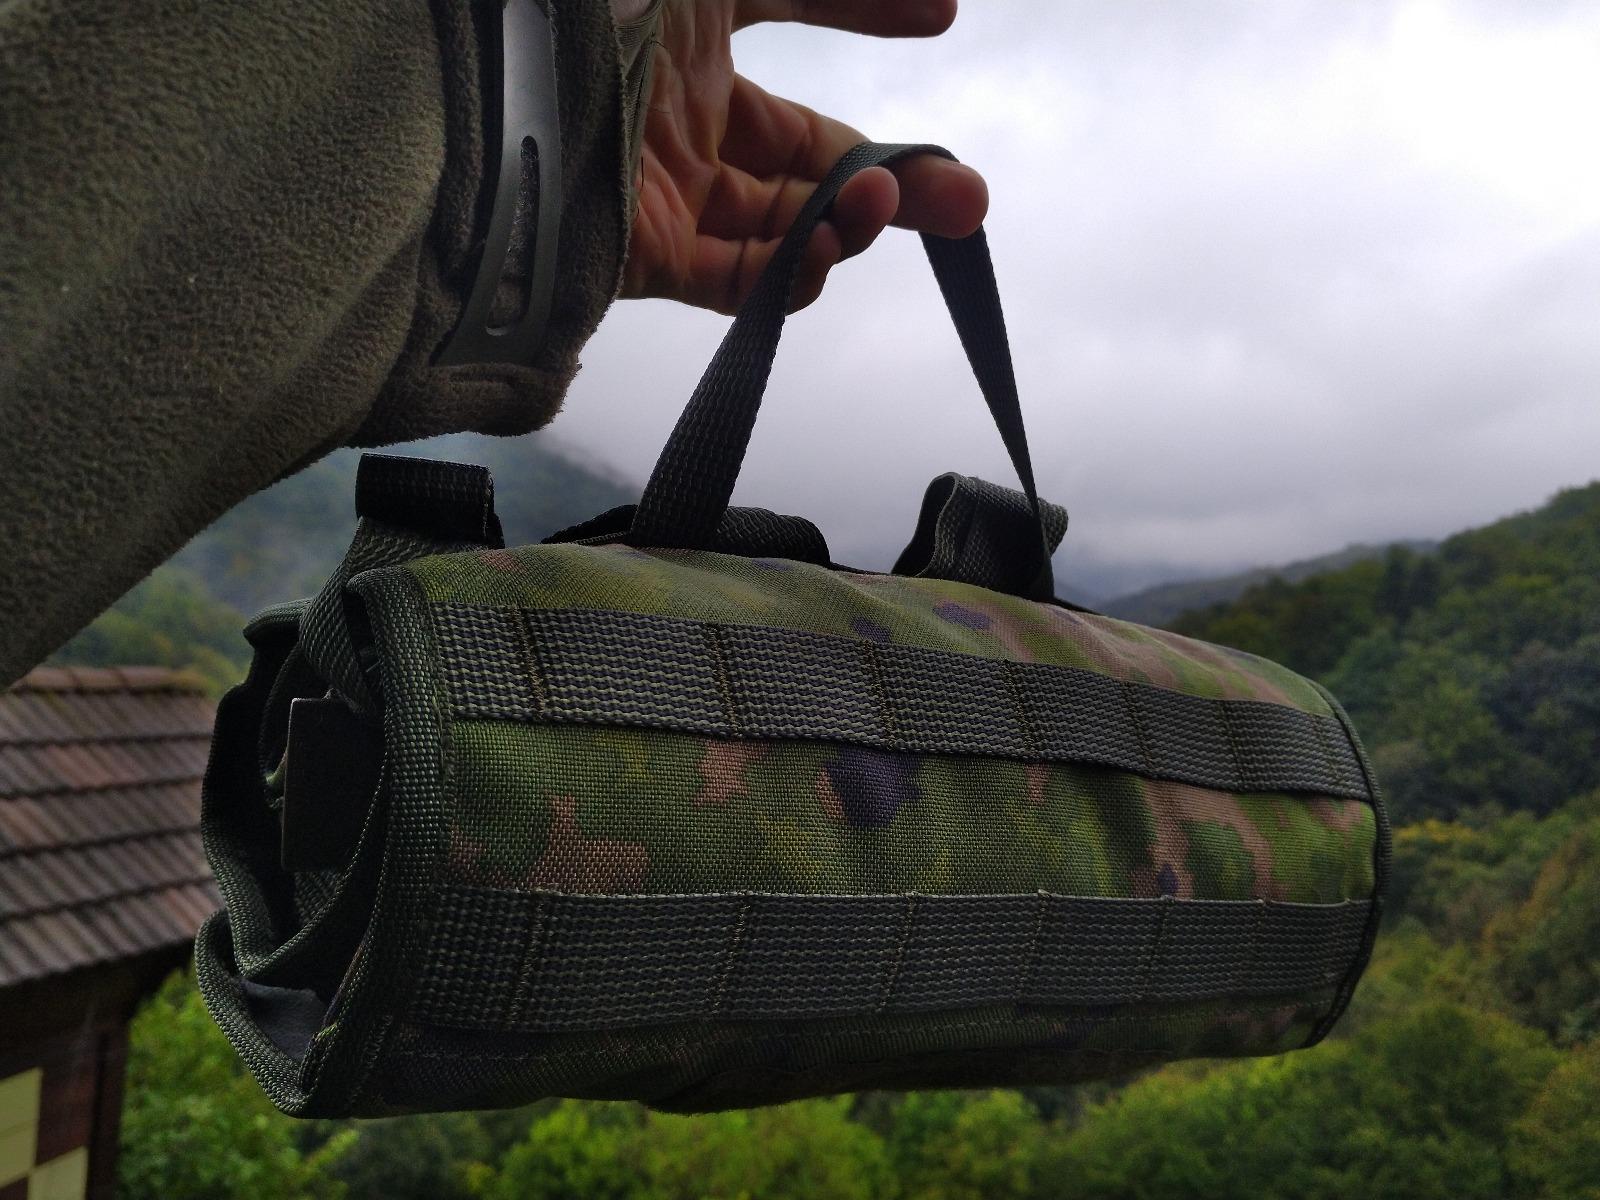 SAVOTTA, vojaški nahrbtnik, ribiški nahrbtnik, nahrbtnik, vojaška trgovina, trgovina z vojaško opremo, B33, opremljen.si, army shop